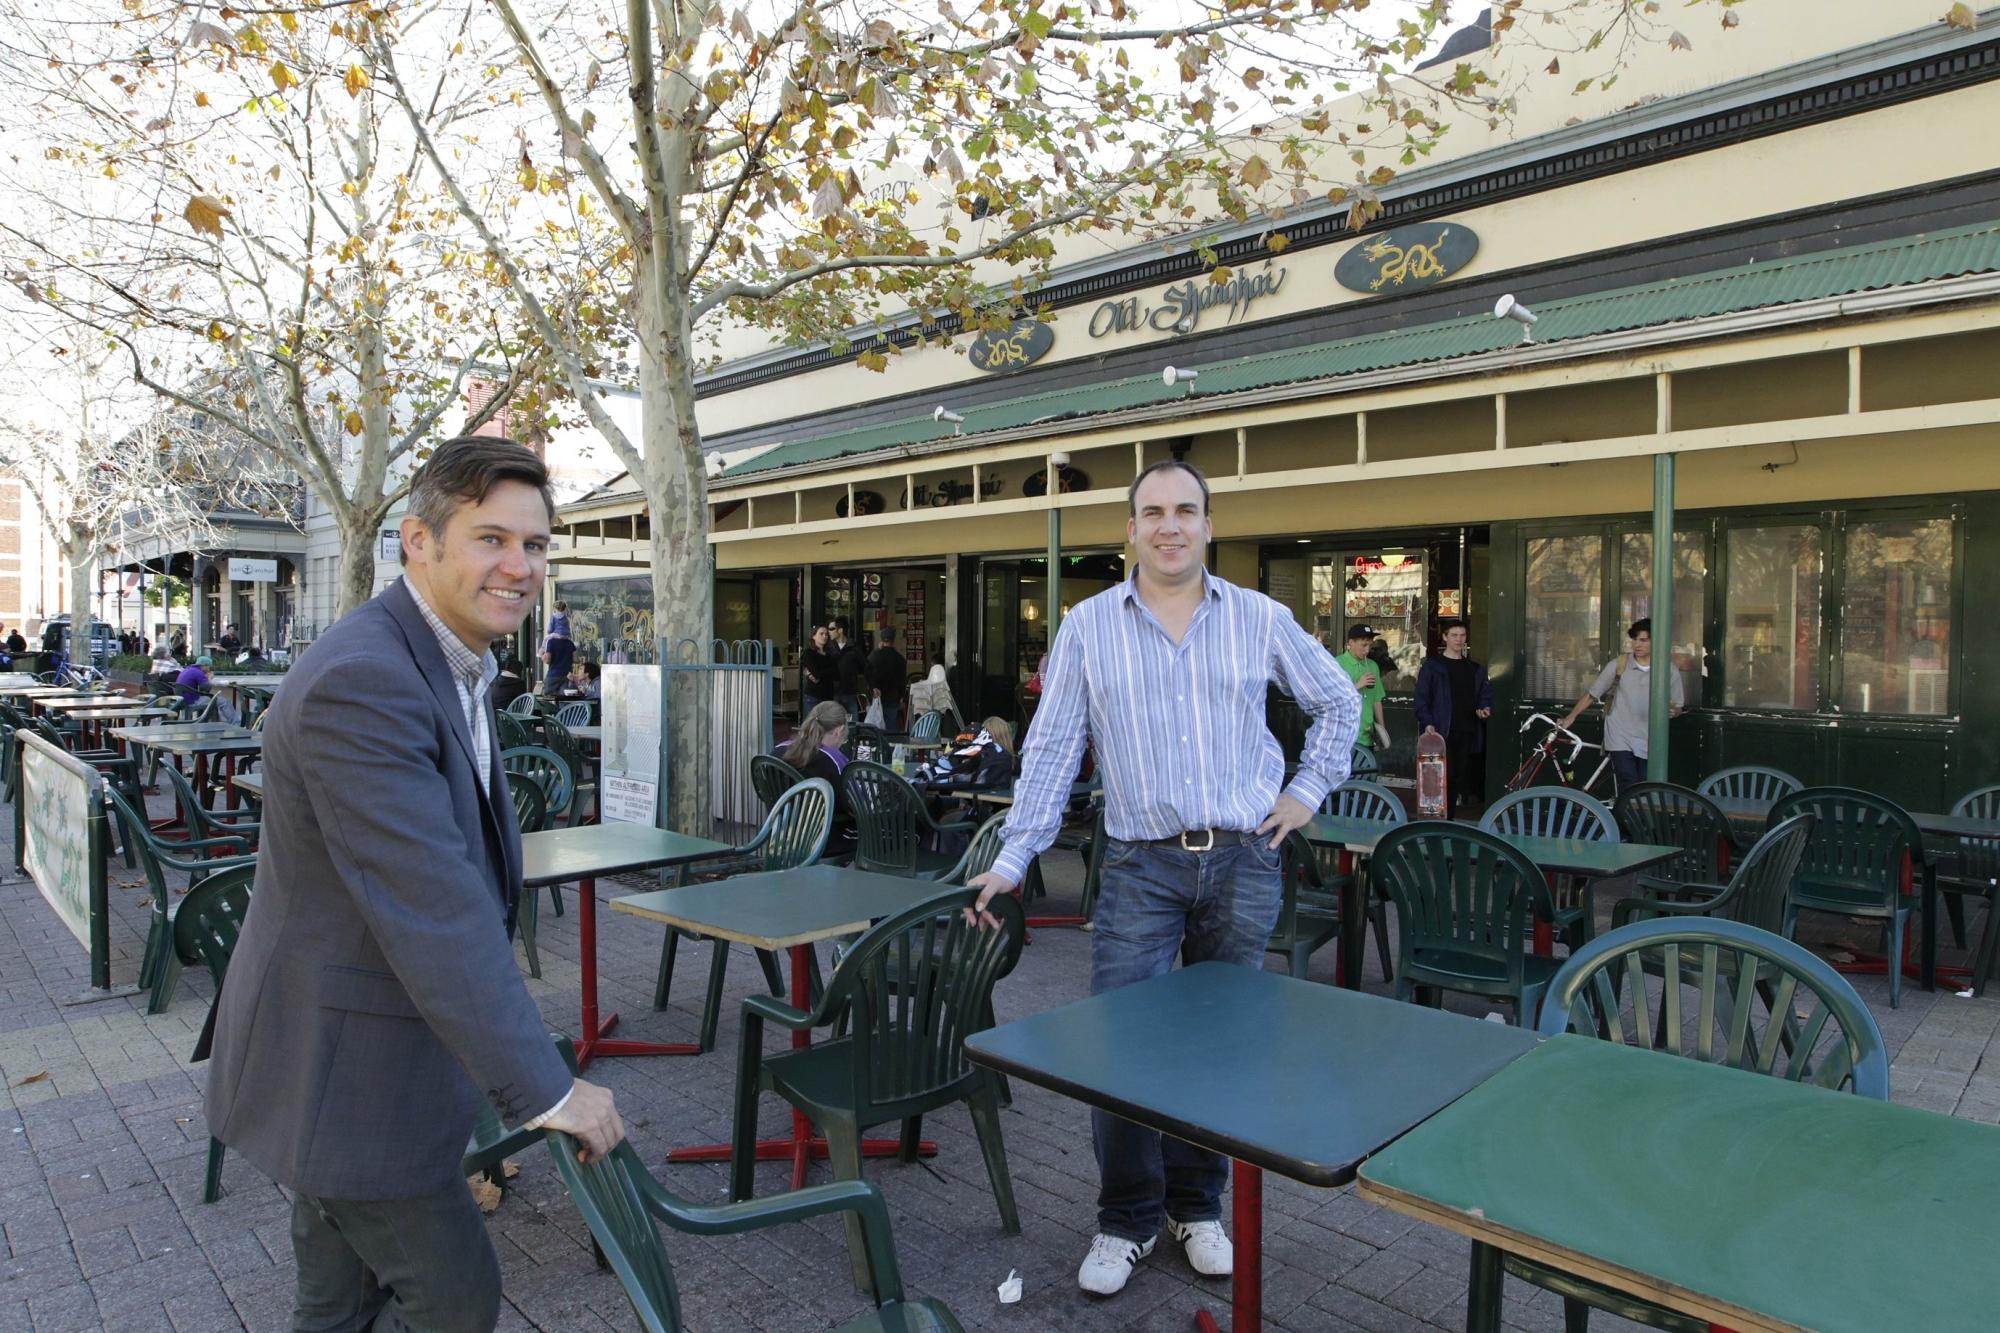 Fremantle Mayor Brad Pettitt and Metropolis owner David Heaton. d404271